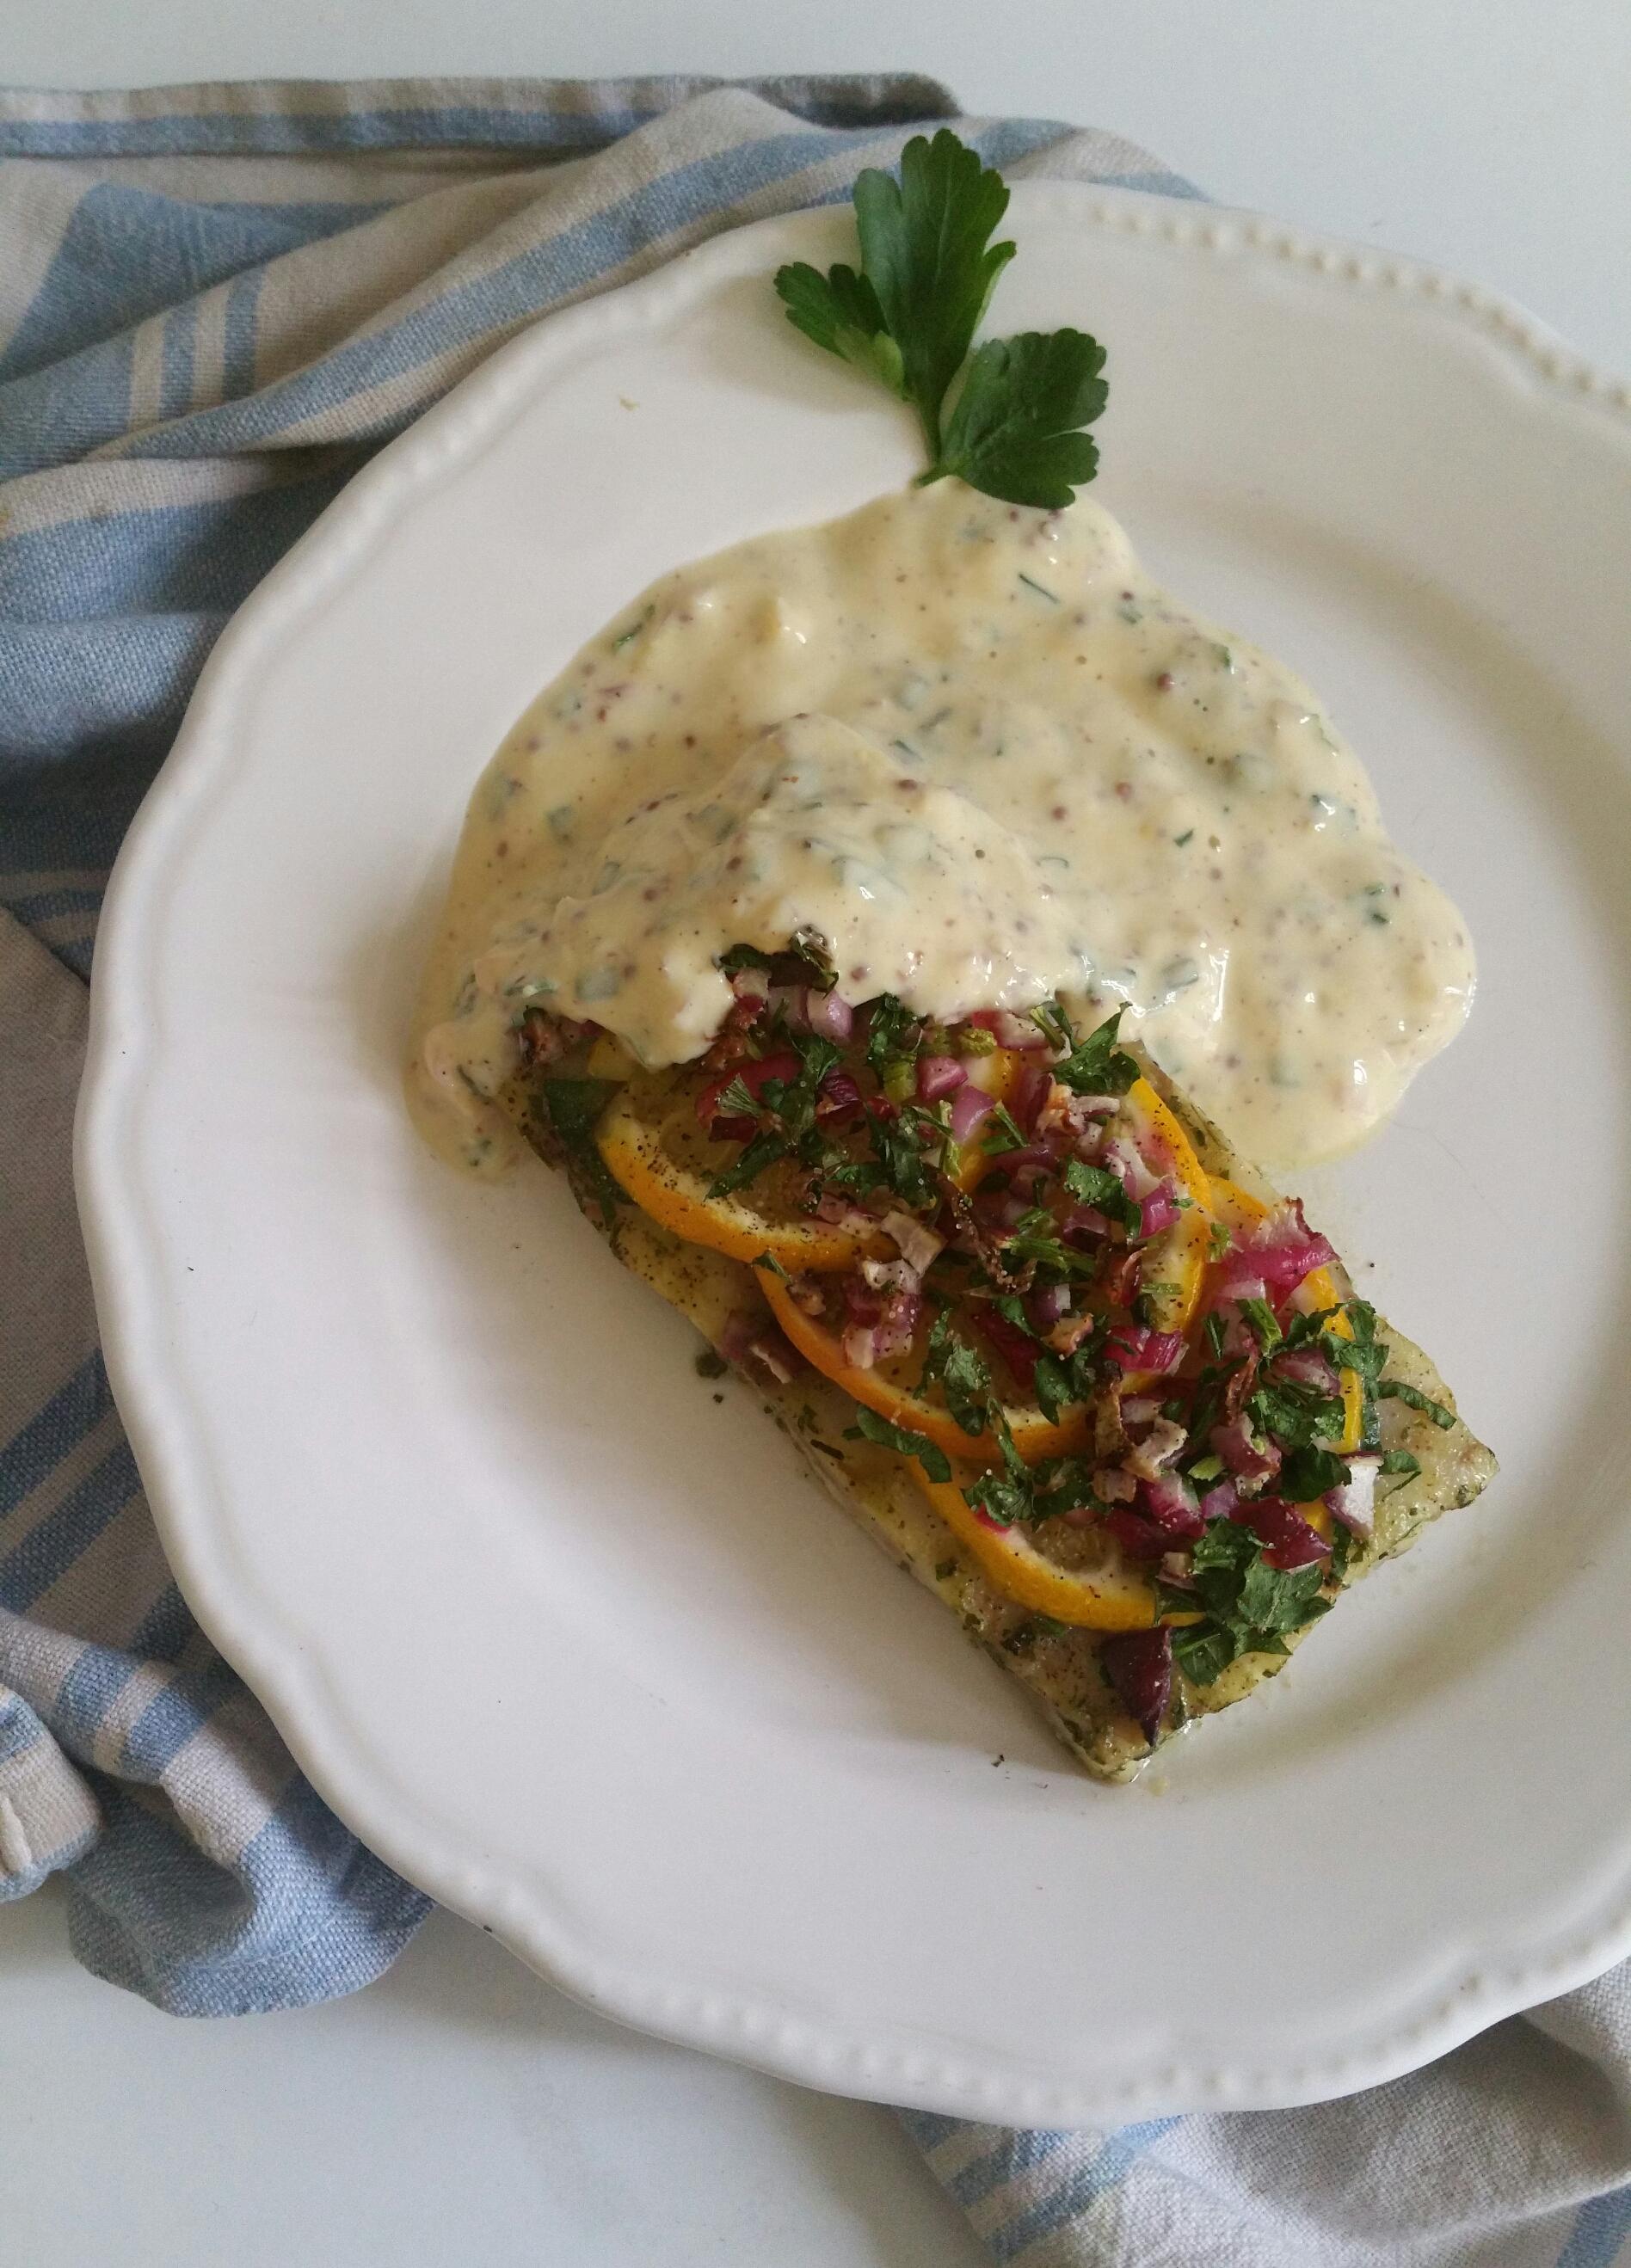 colin et sauce béarnaise allégée